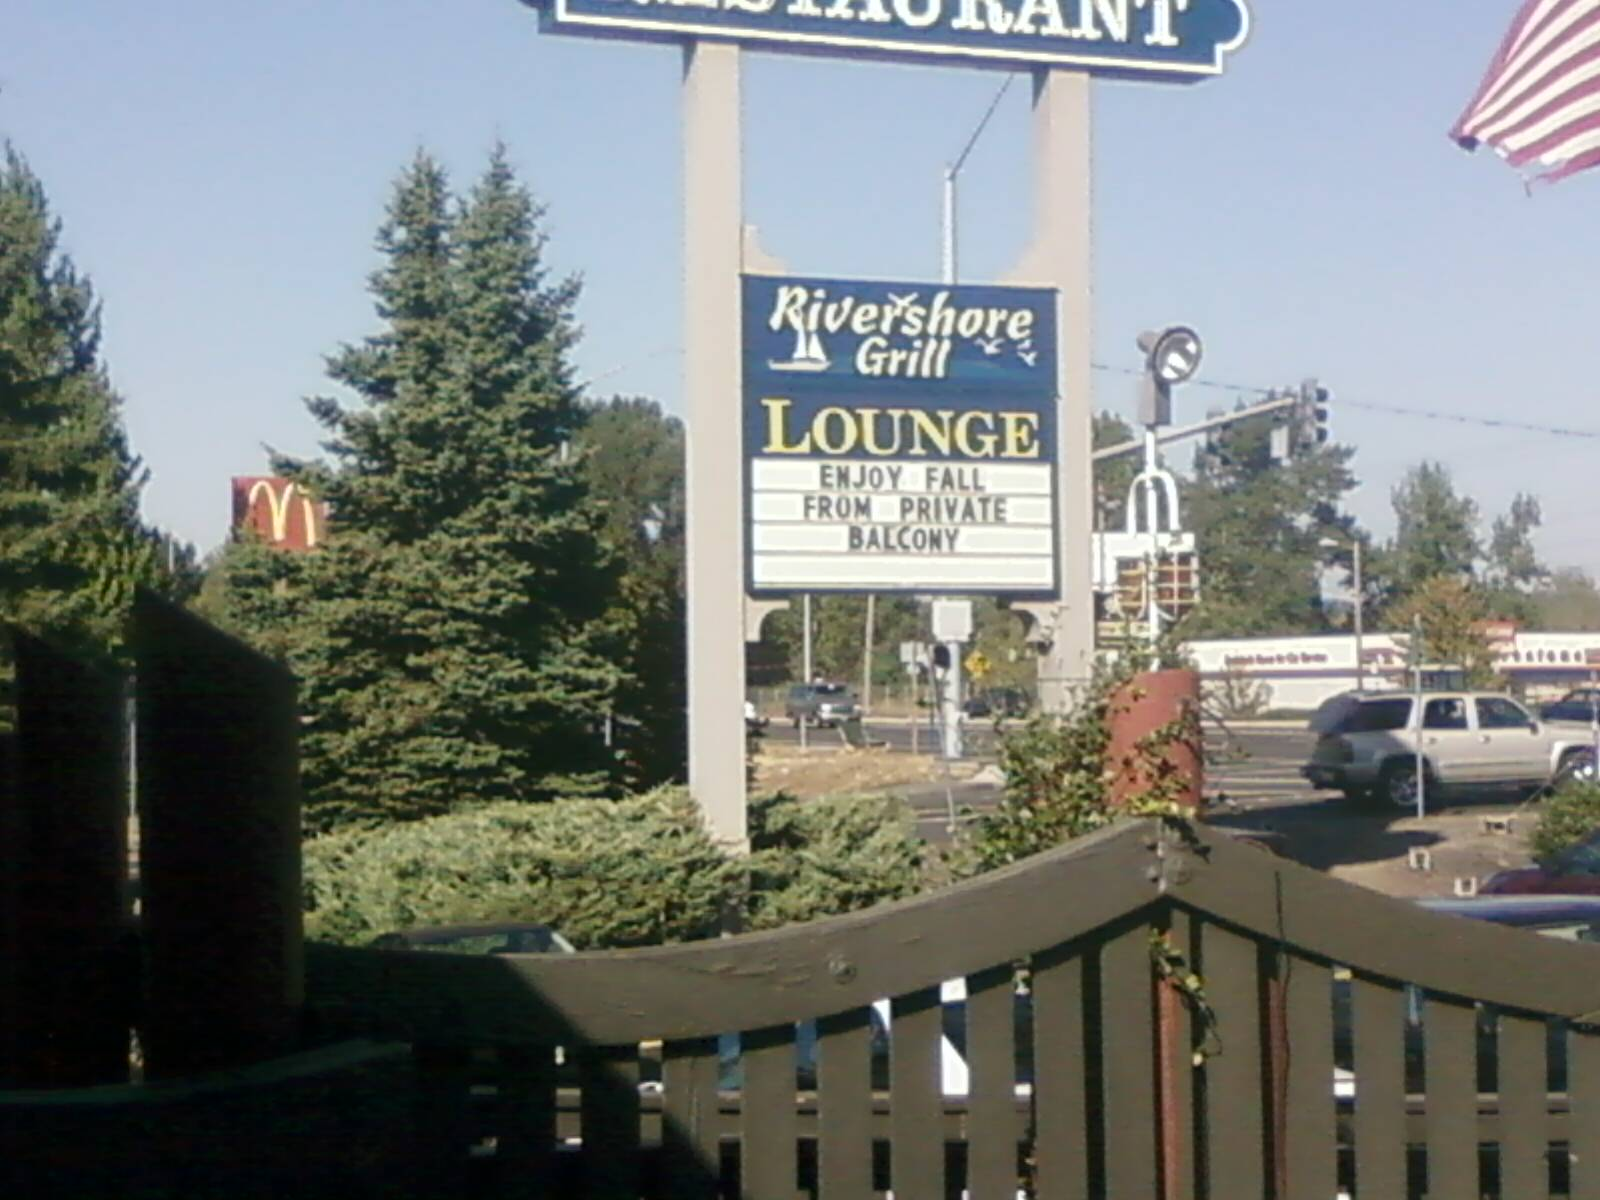 Hotel unintentionally endorses suicide.